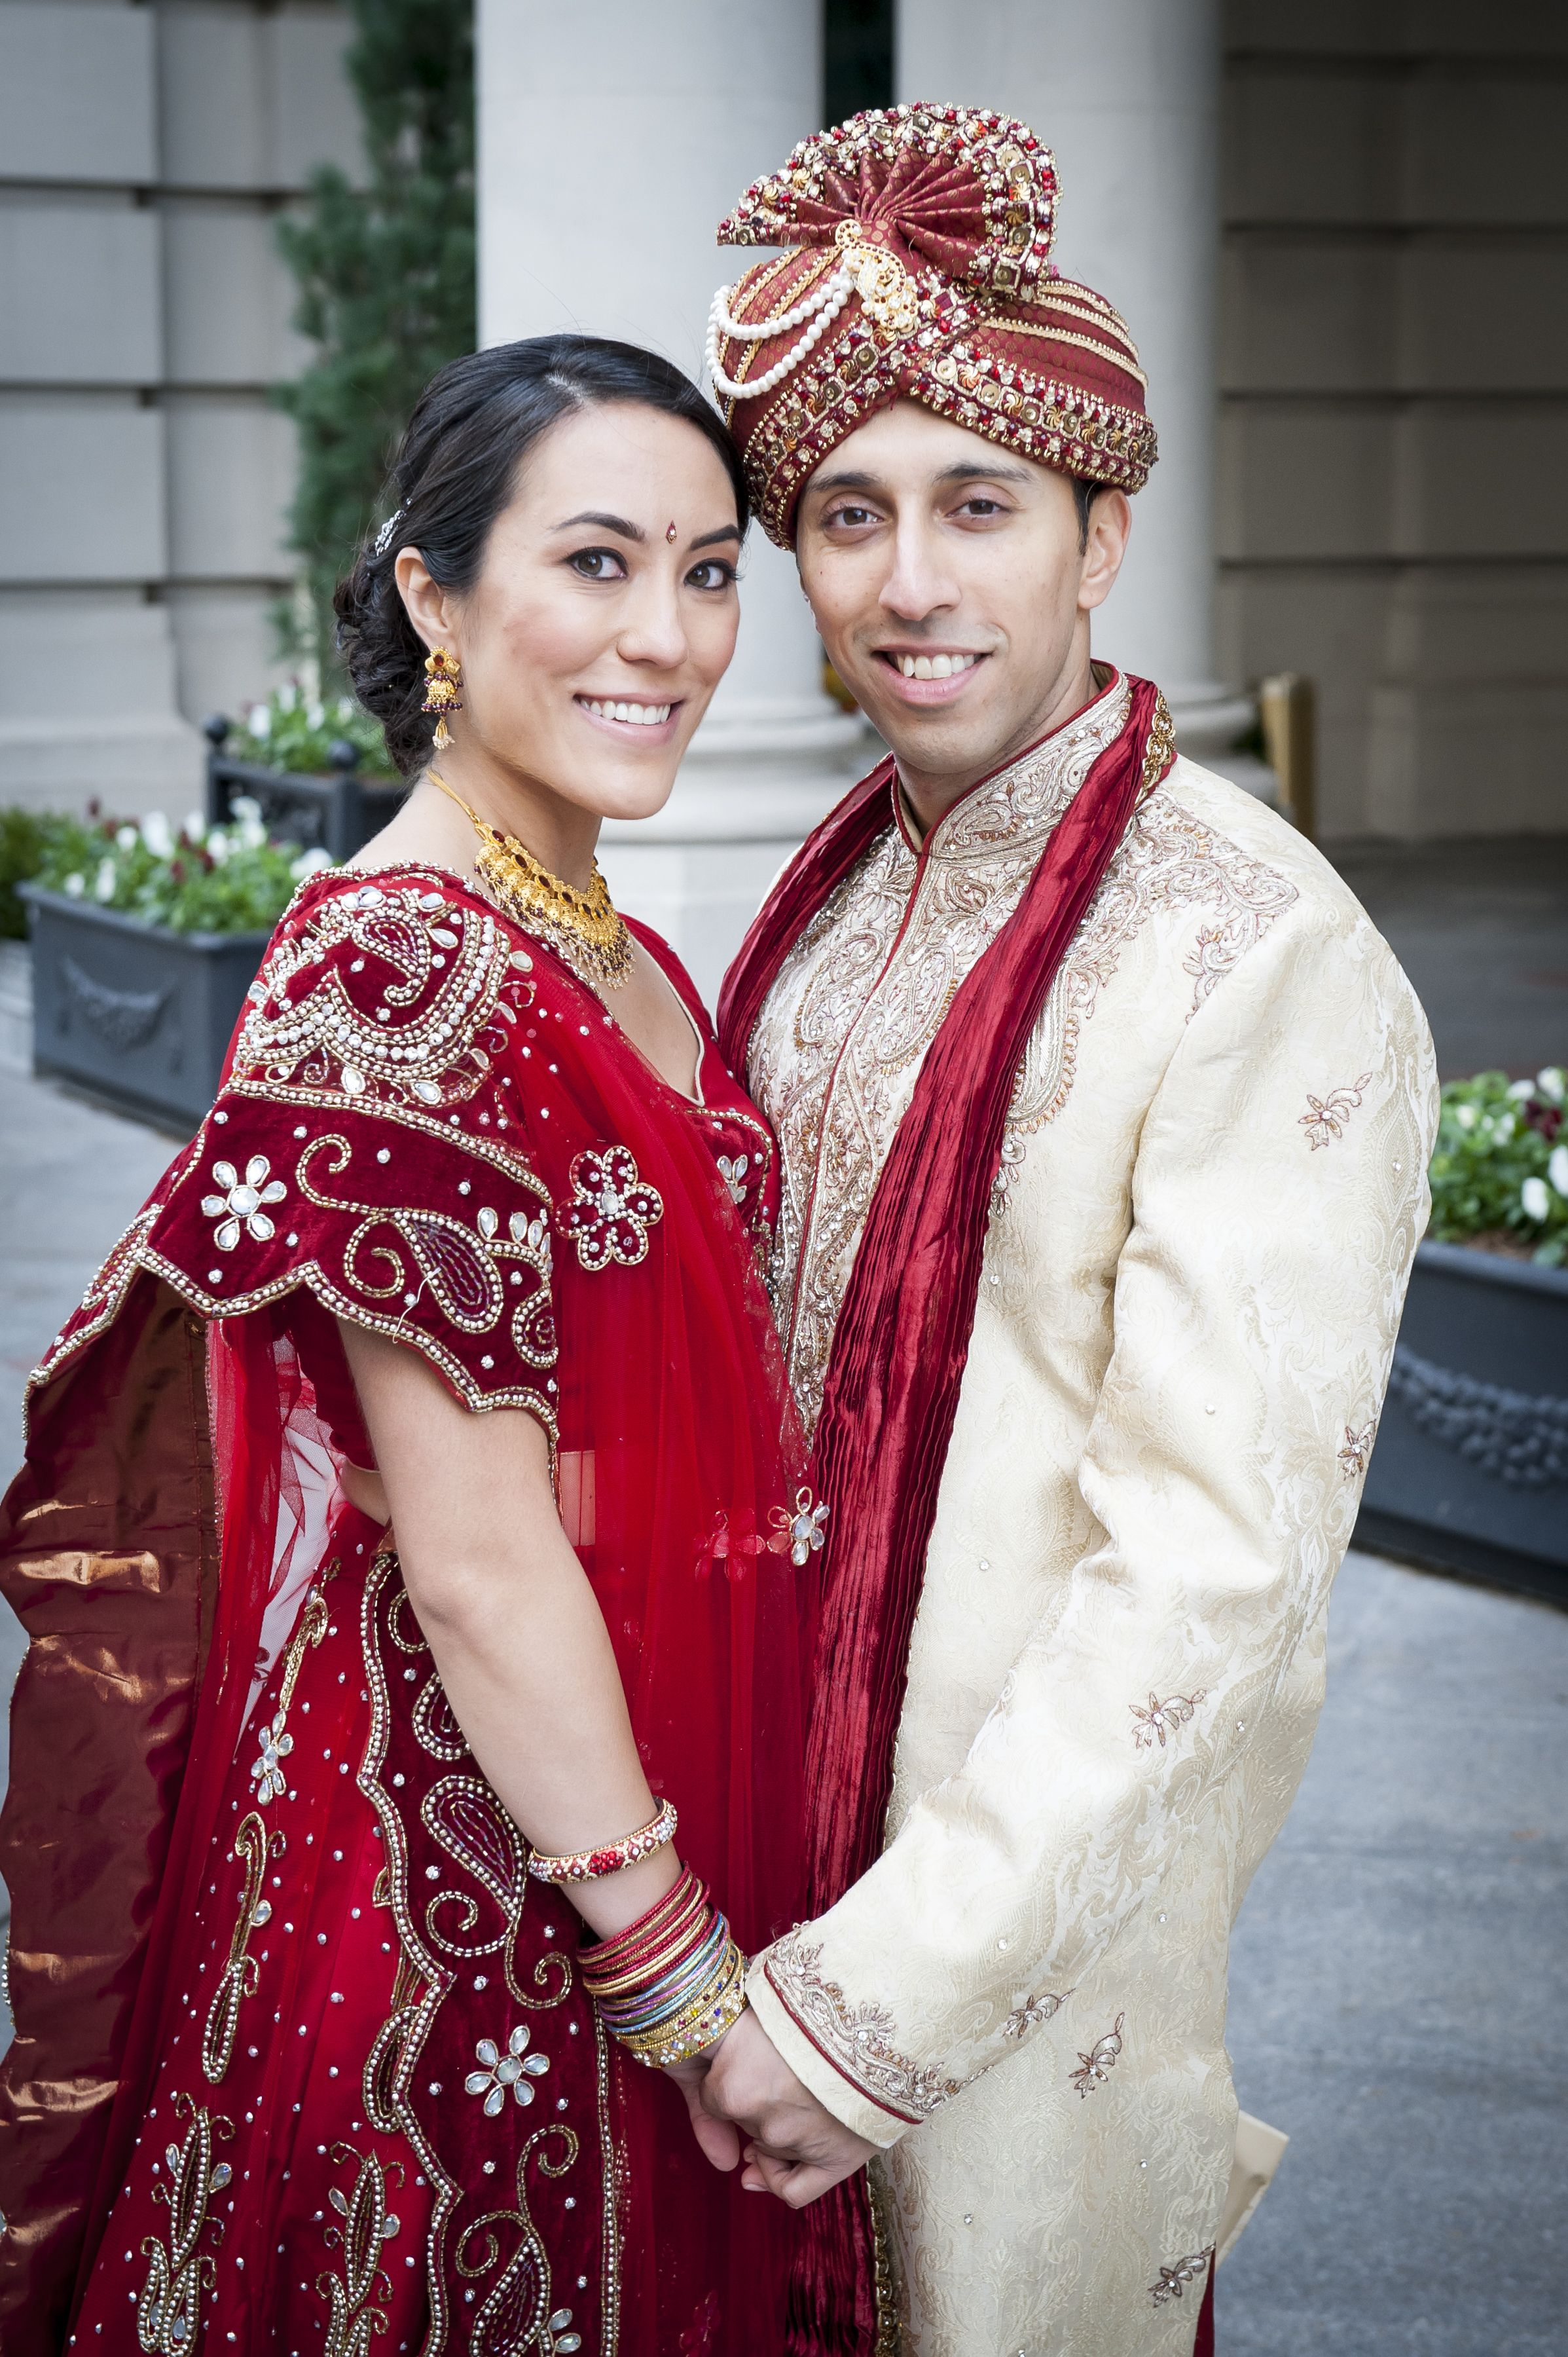 KoreanAmerican bride and Indian groom Indian wedding in